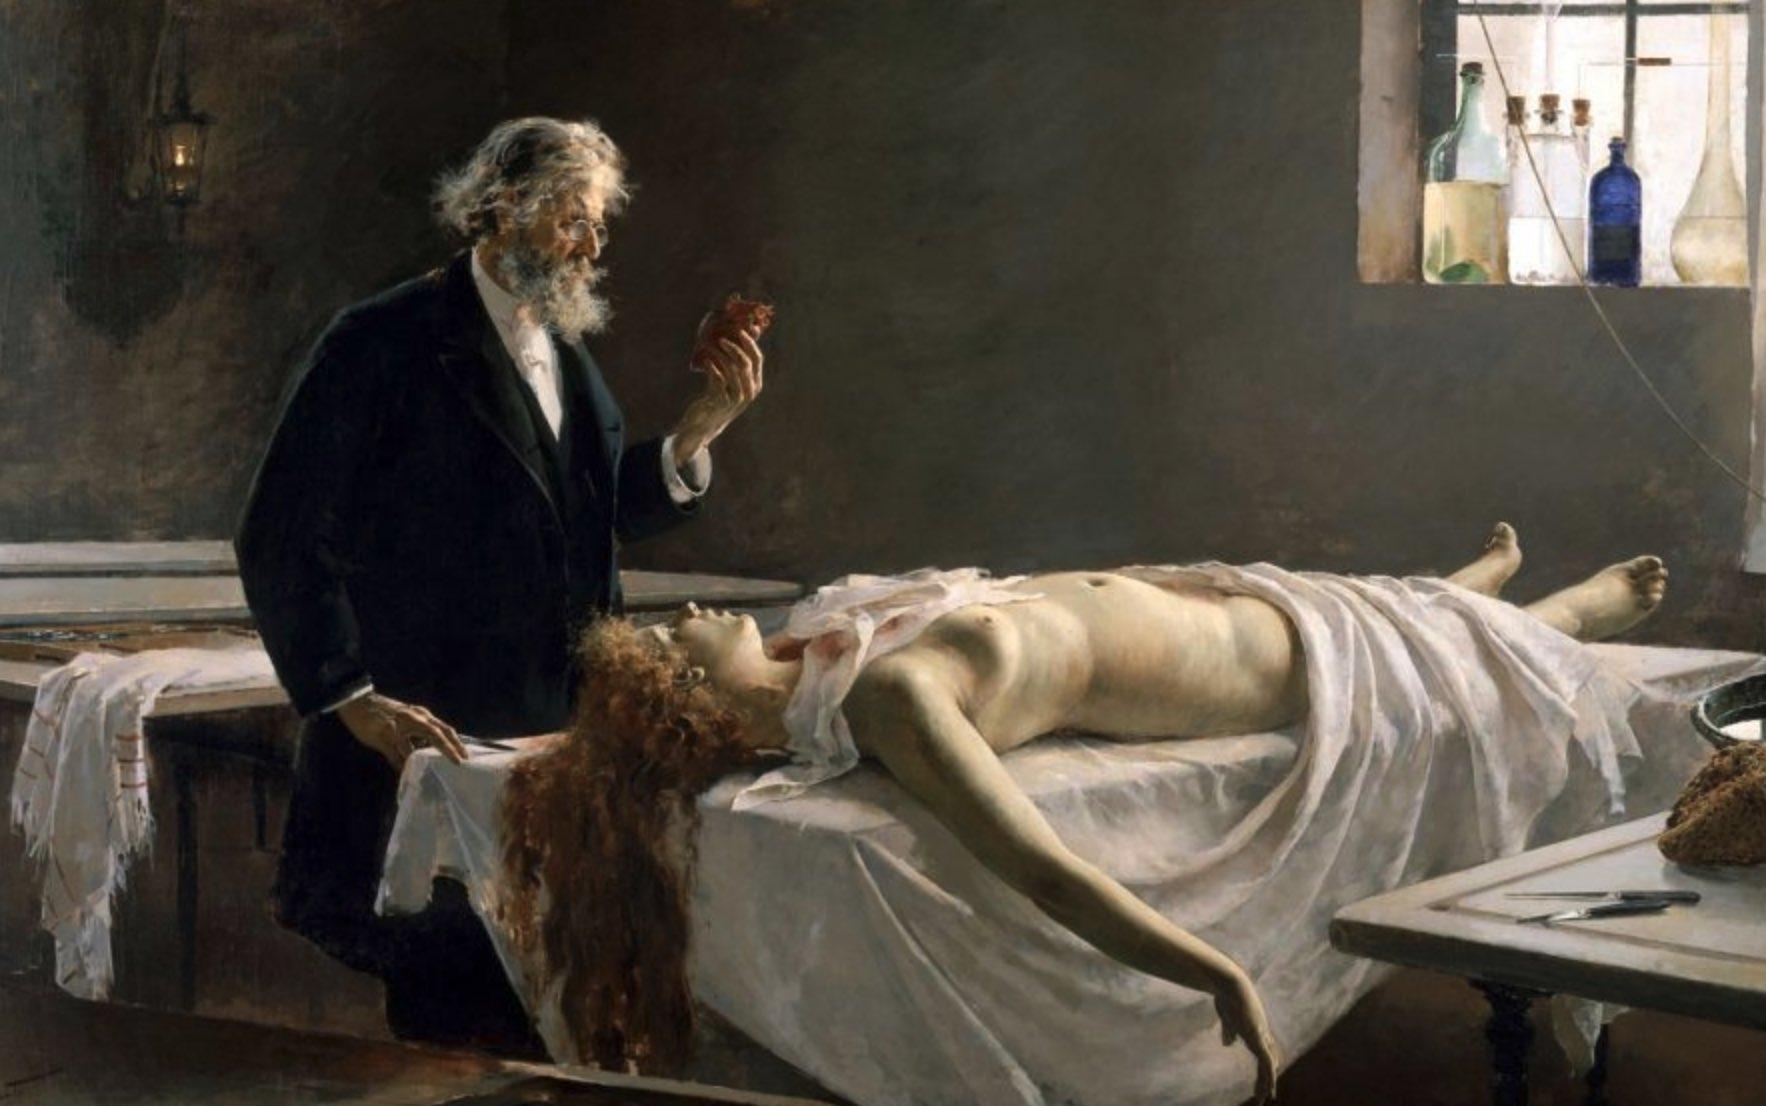 Tanatología, Alberto Fernández